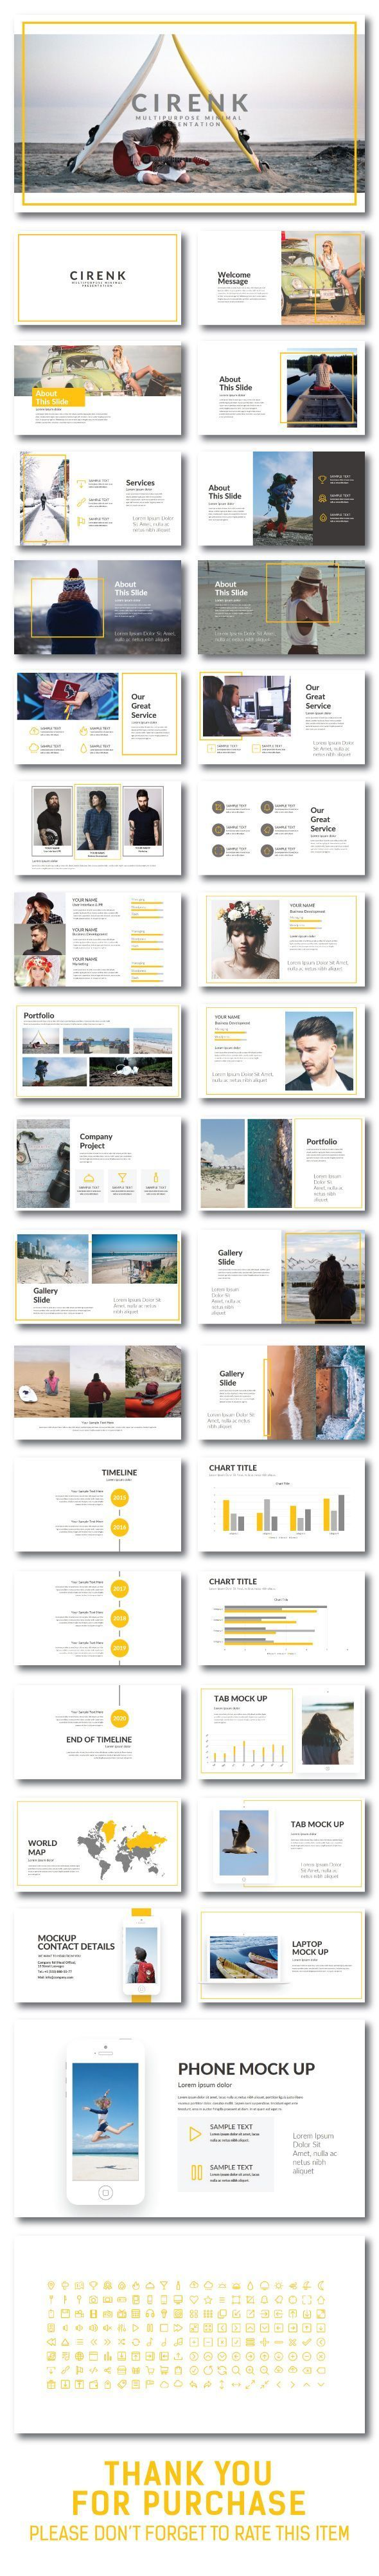 Cirenk Presentation Template - Creative PowerPoint Templates